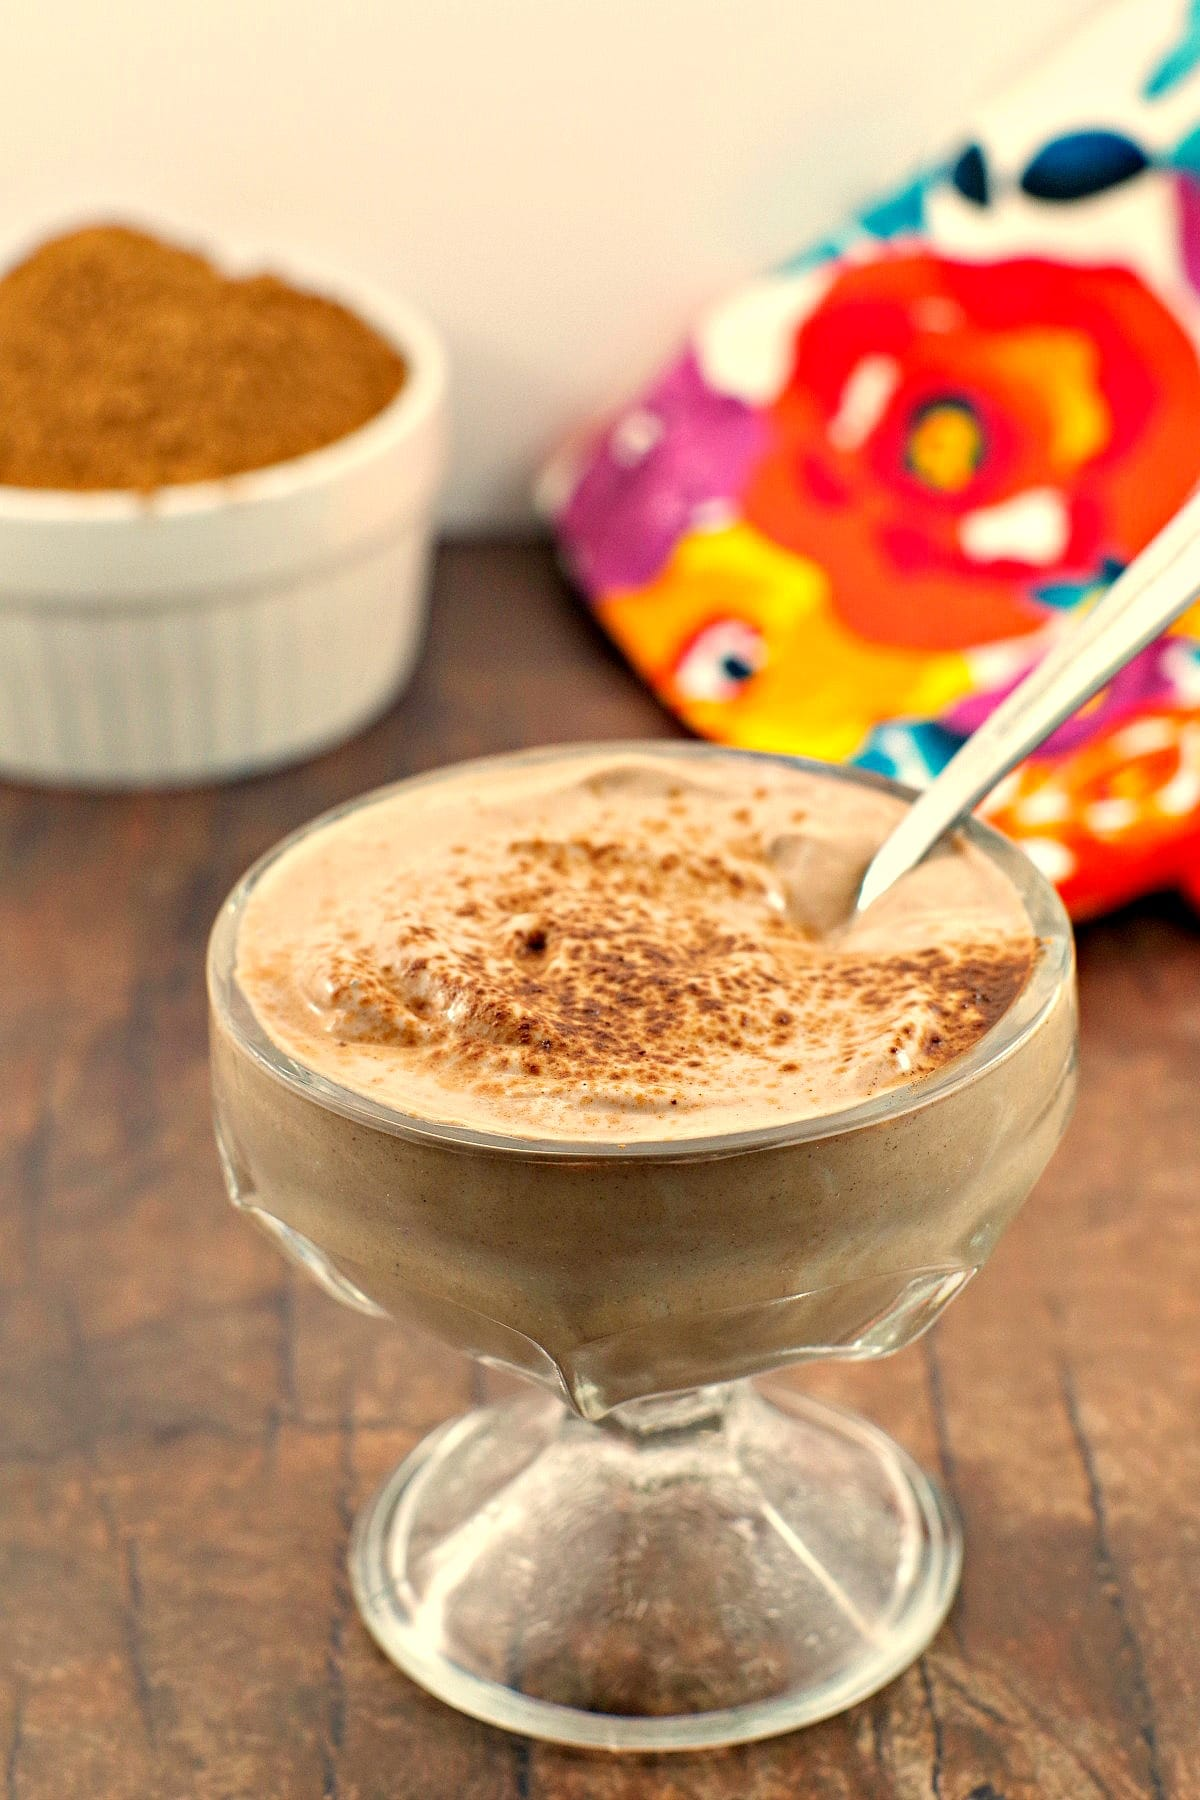 Chocolate Yogurt |#chocolate #yogurt - Foodmeanderings.com